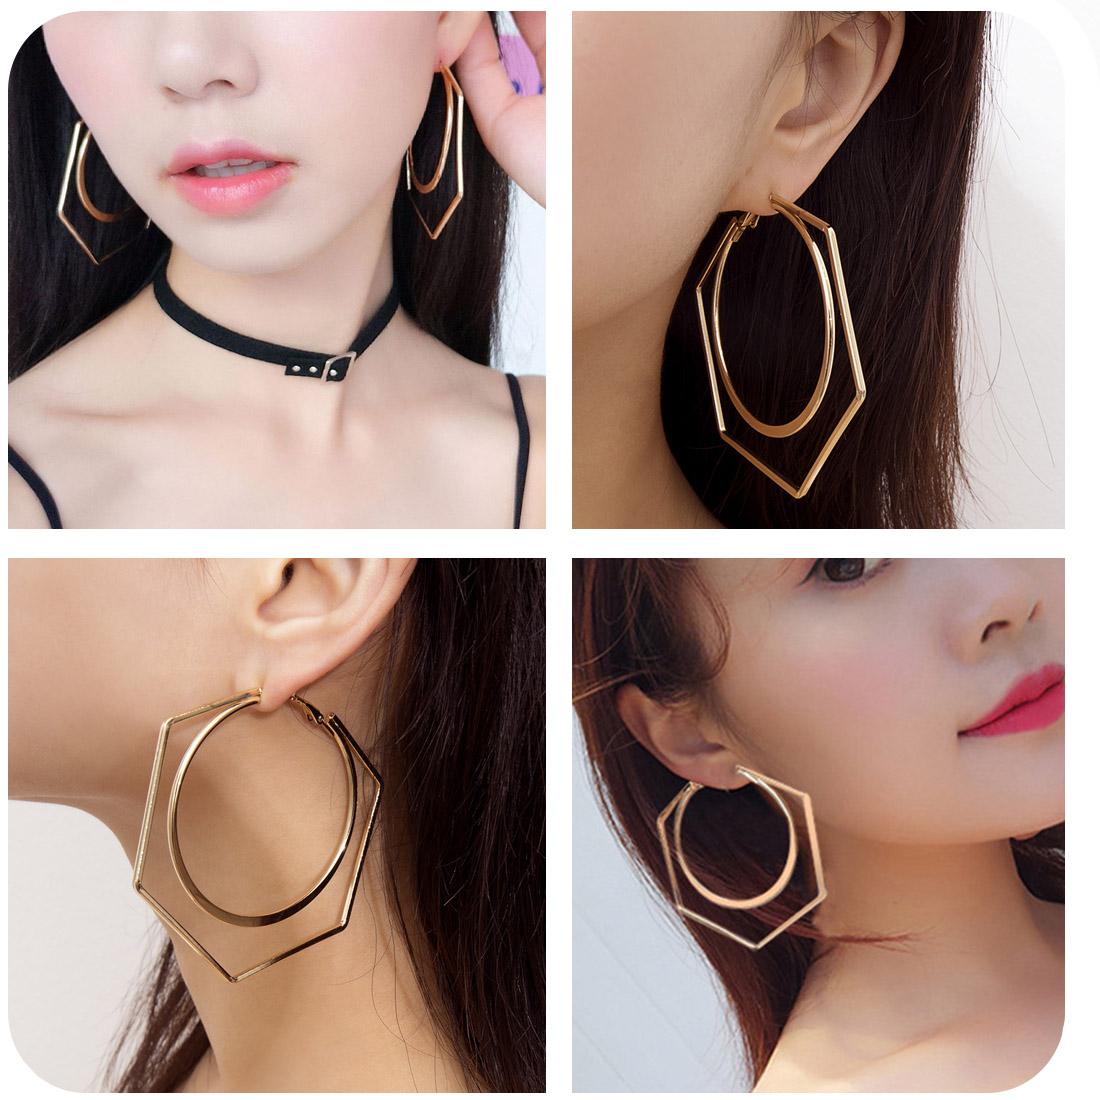 Goldenplated Silver  Hypoallergenic earrings Green Enamel Big Golden Hoops Gift for her Statement earrings Dangled Hoop Earrings